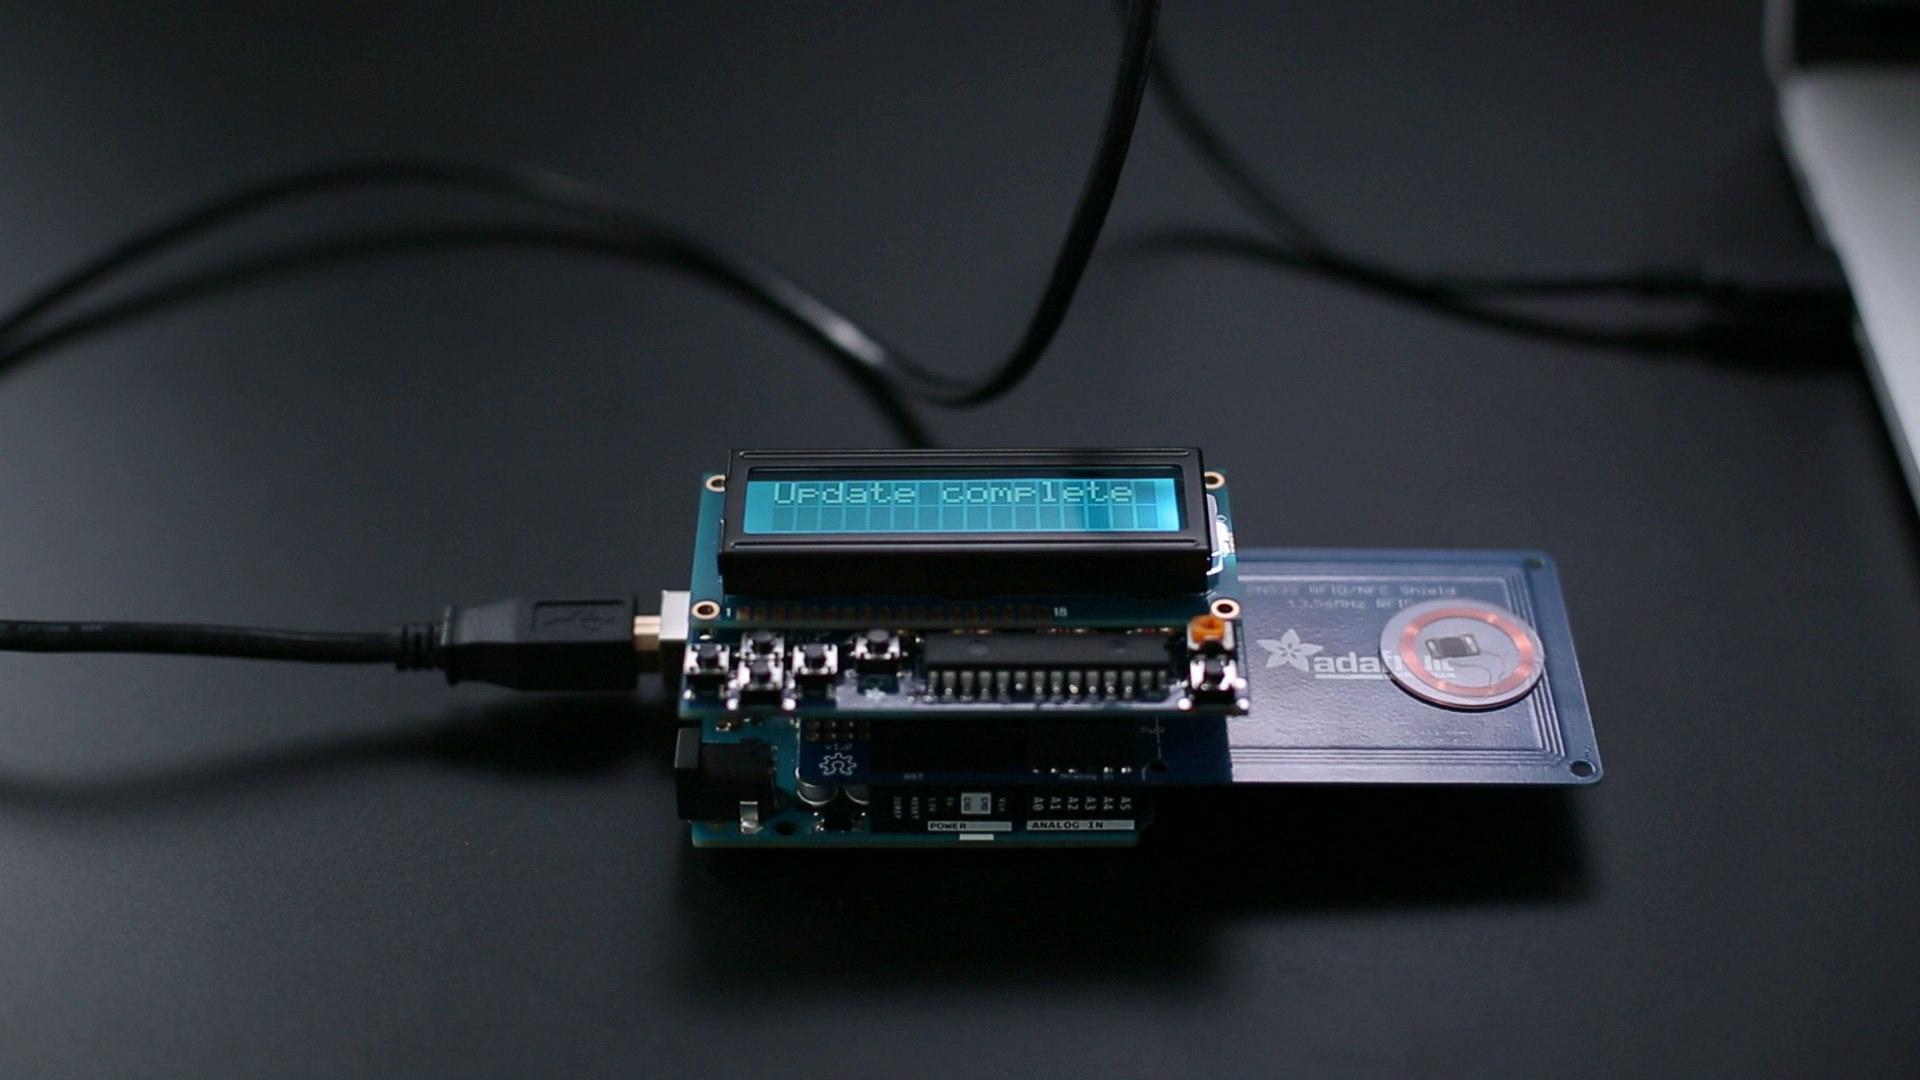 projects_Collin's_Lab_-_RFID-a-9.jpeg